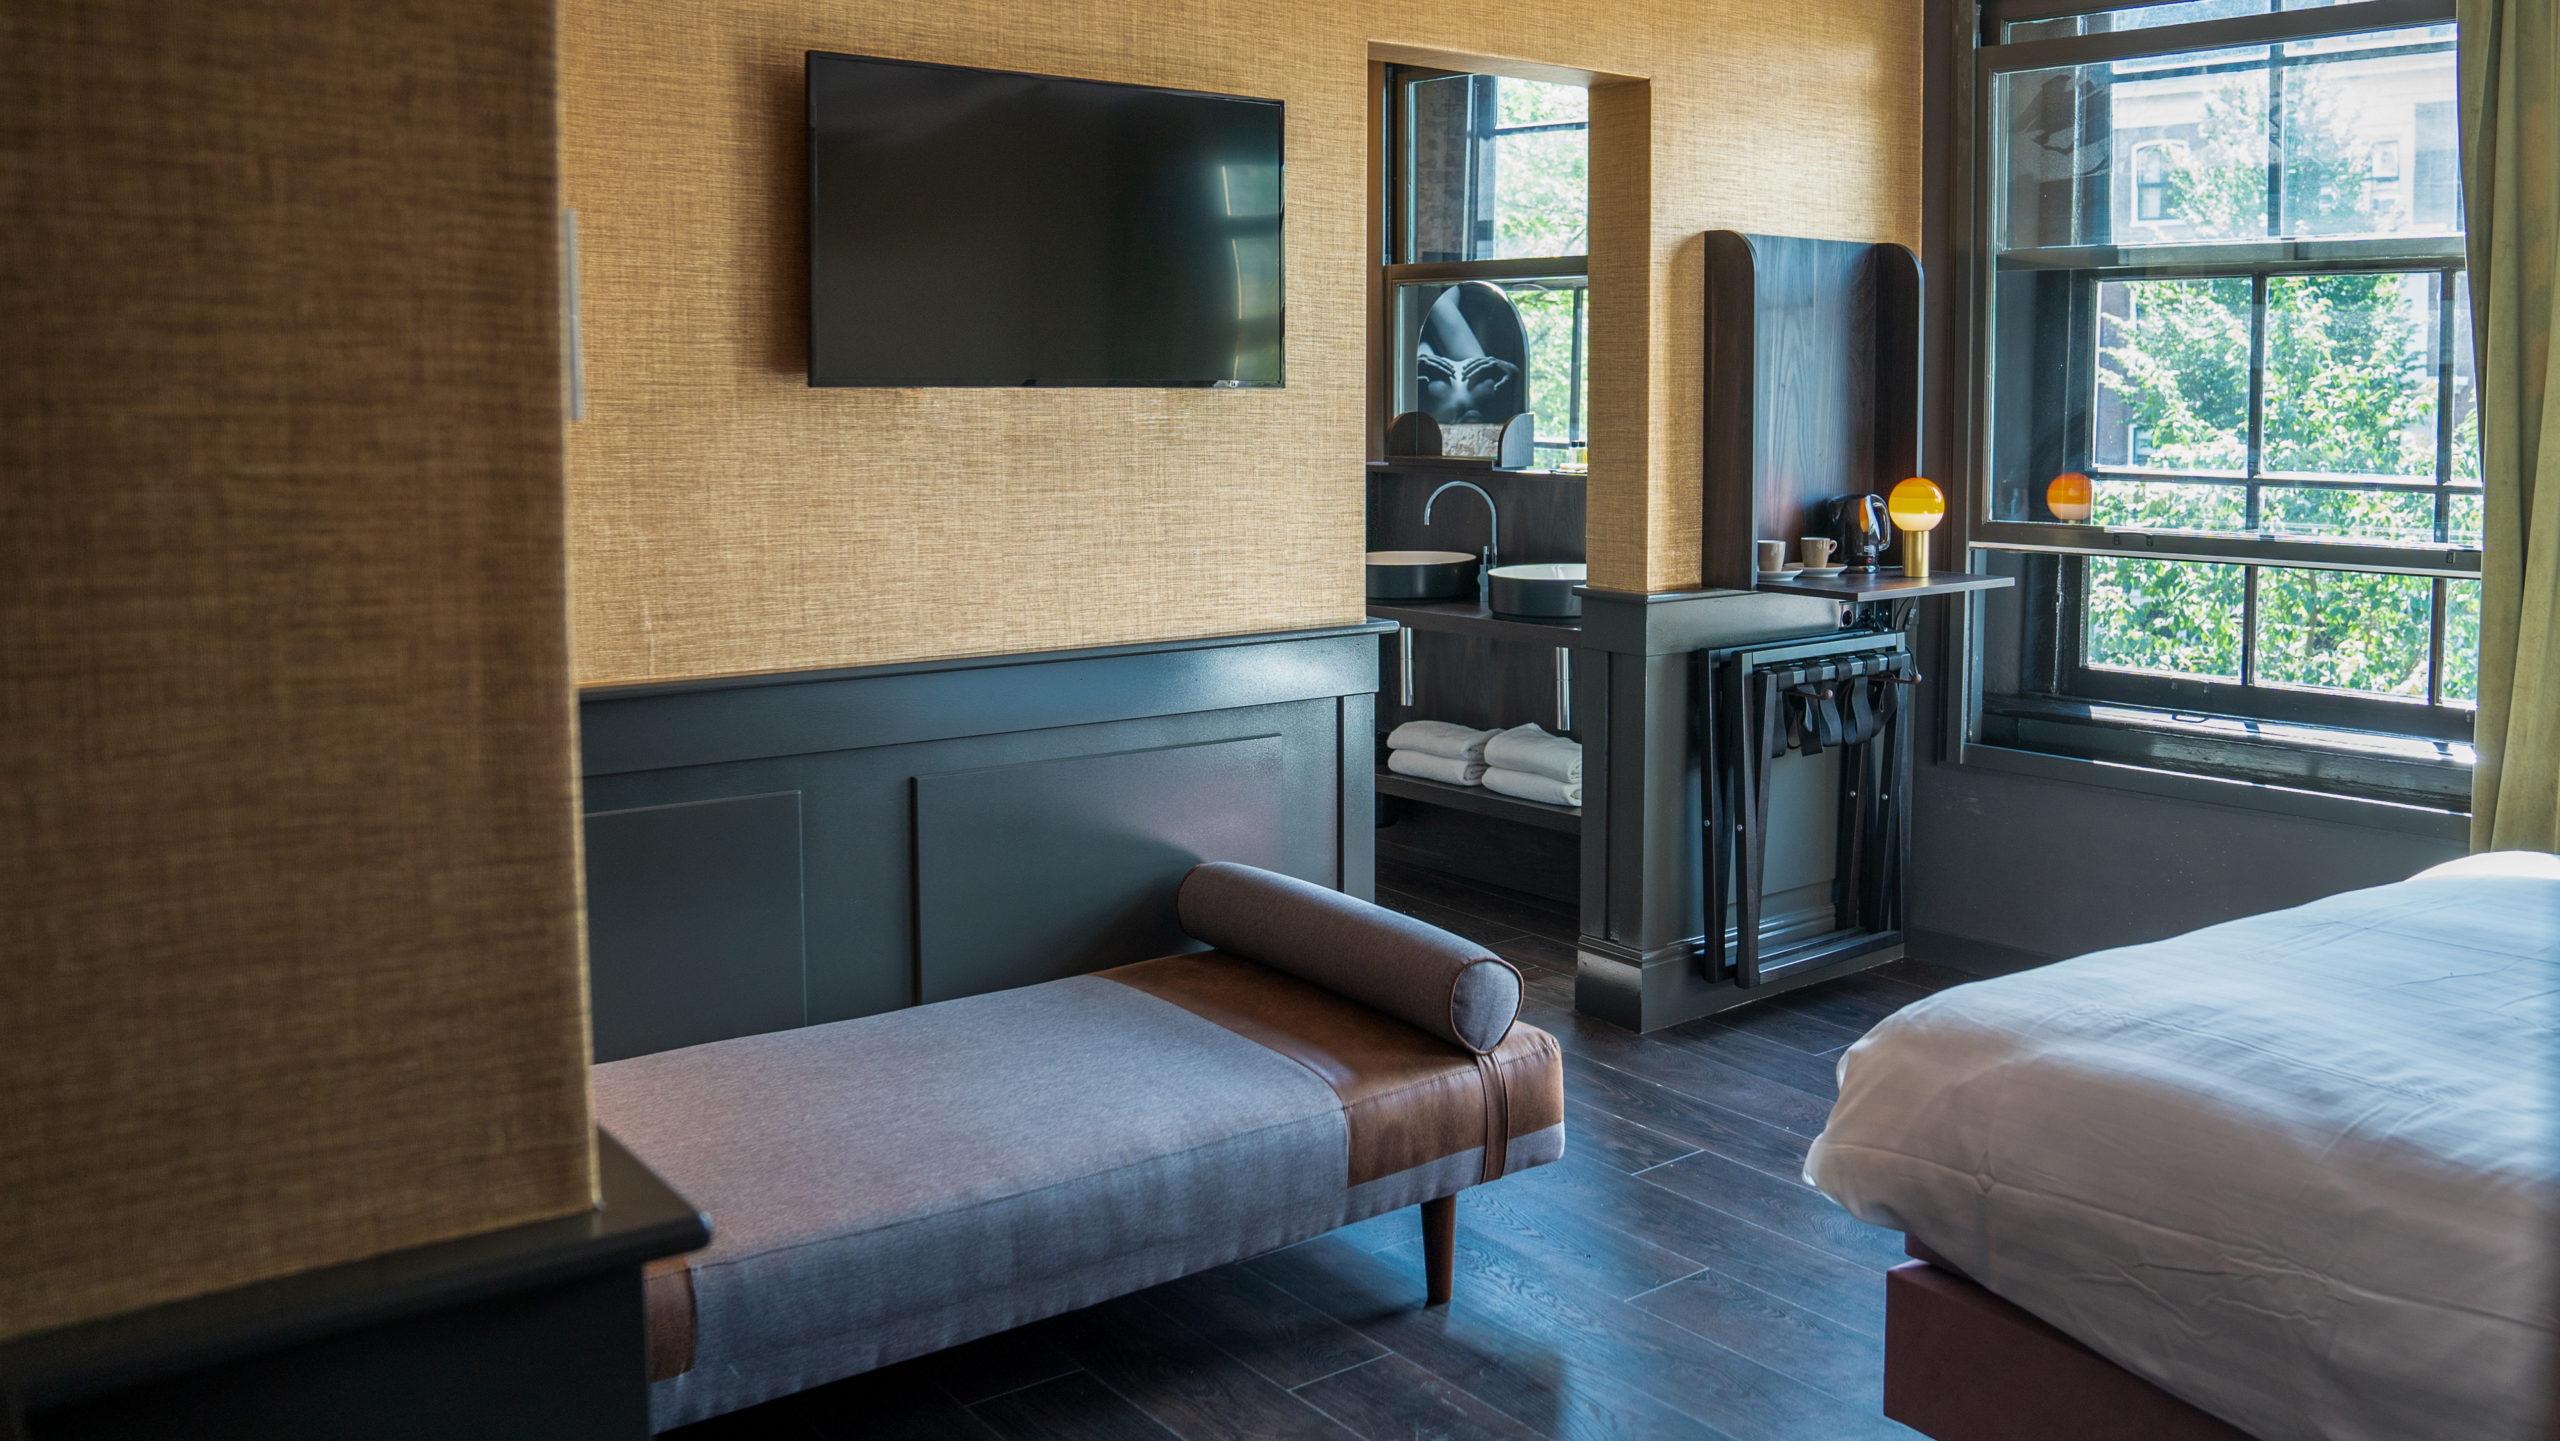 hotel_1666_thorbecke_jeroendenijs_bni_amsterdam_suite_boutique